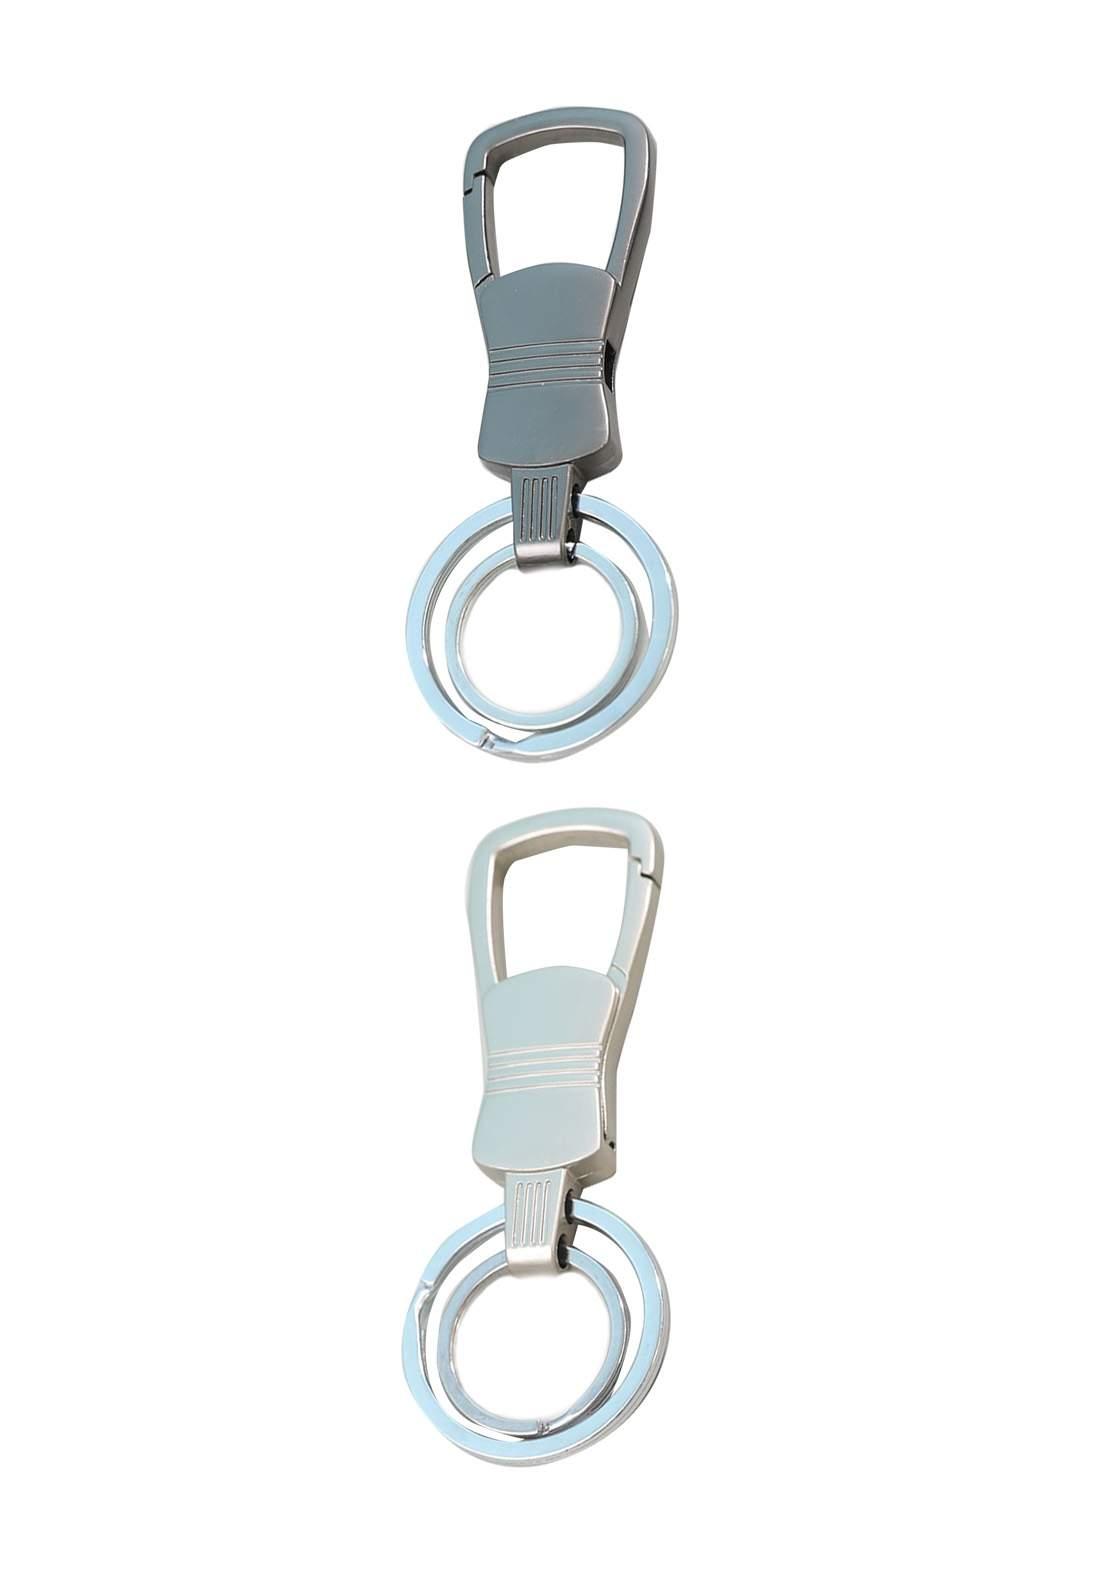 ميدالية مفاتيح  معدنية من Ilahui